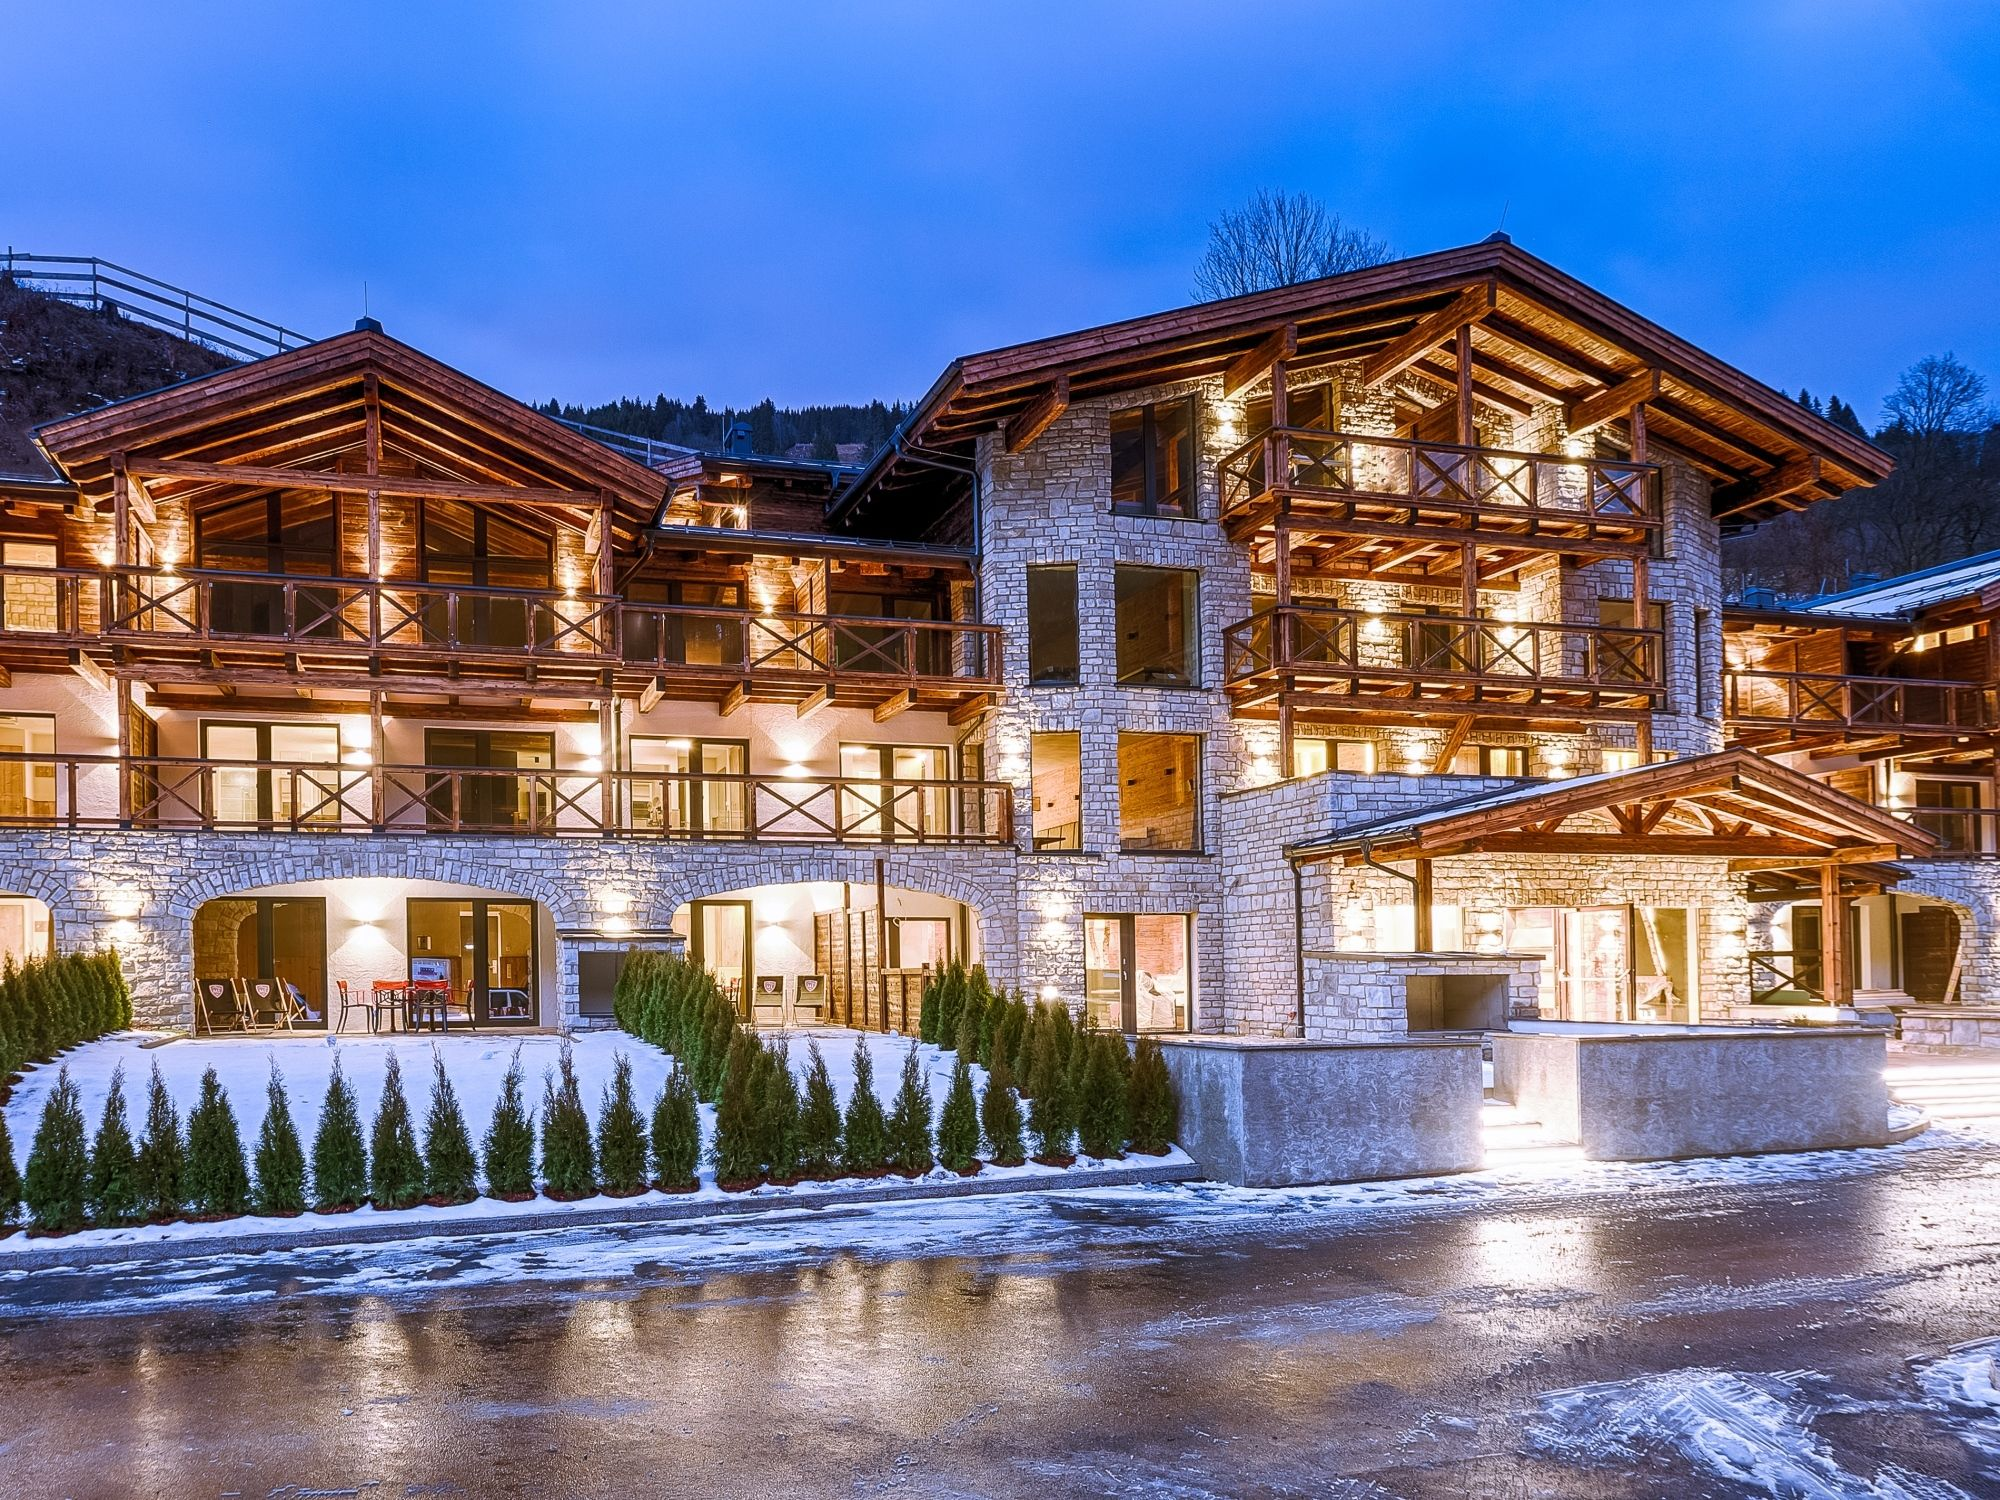 Appartement Avenida Mountain Lodges Saalbach Penthouse 3 slaapkamers, incl. ontbijt - 6-8 personen